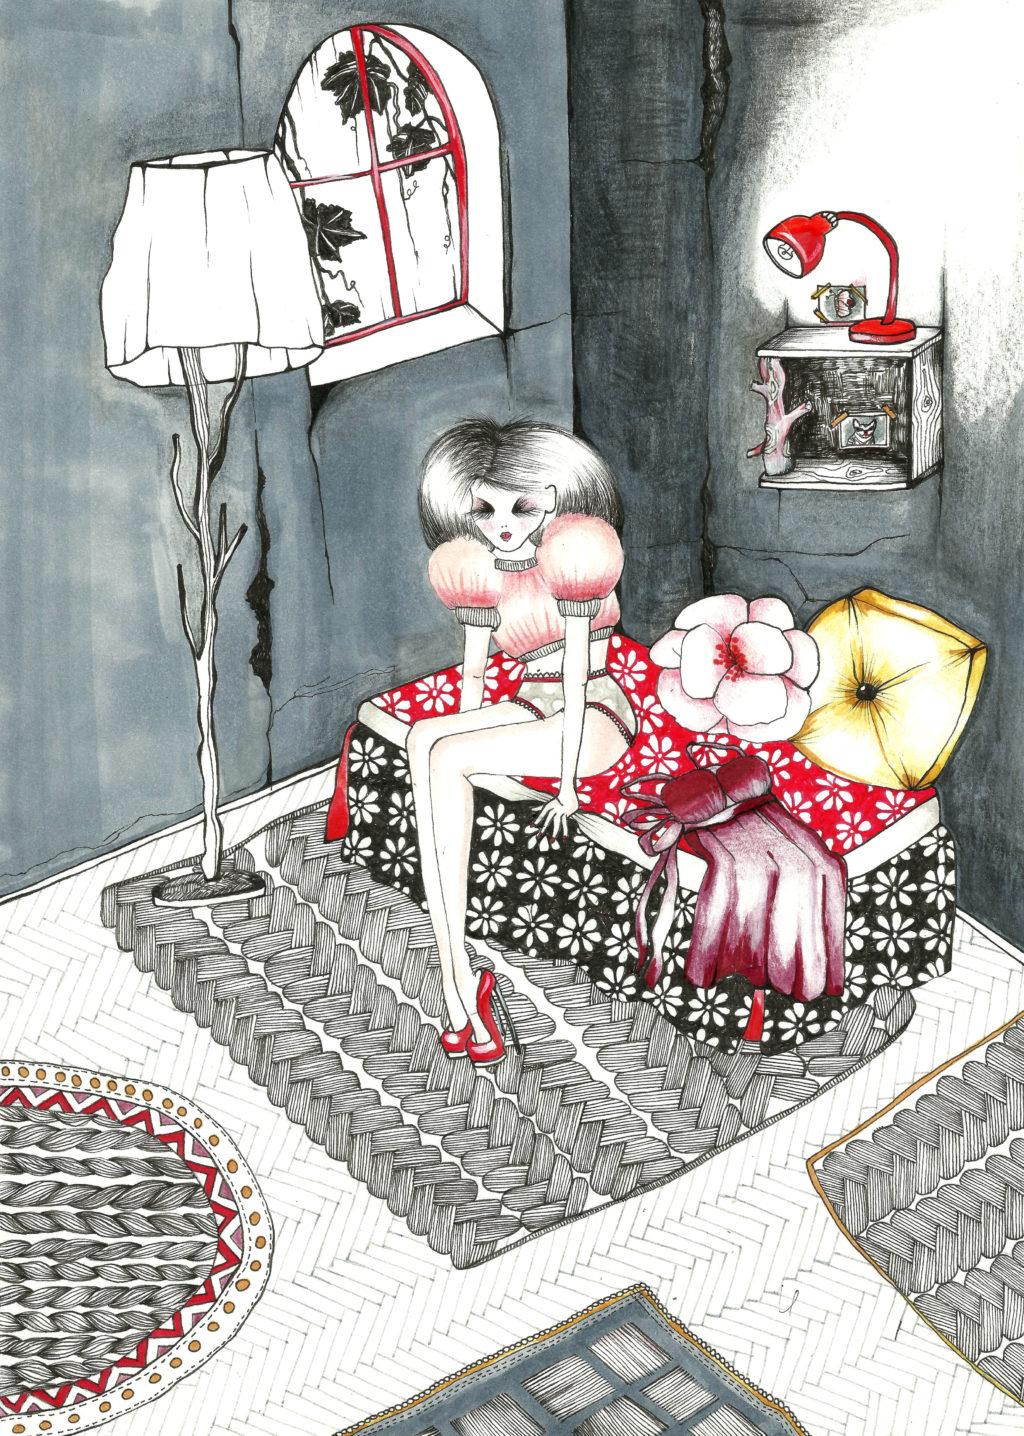 Bedroomgirl